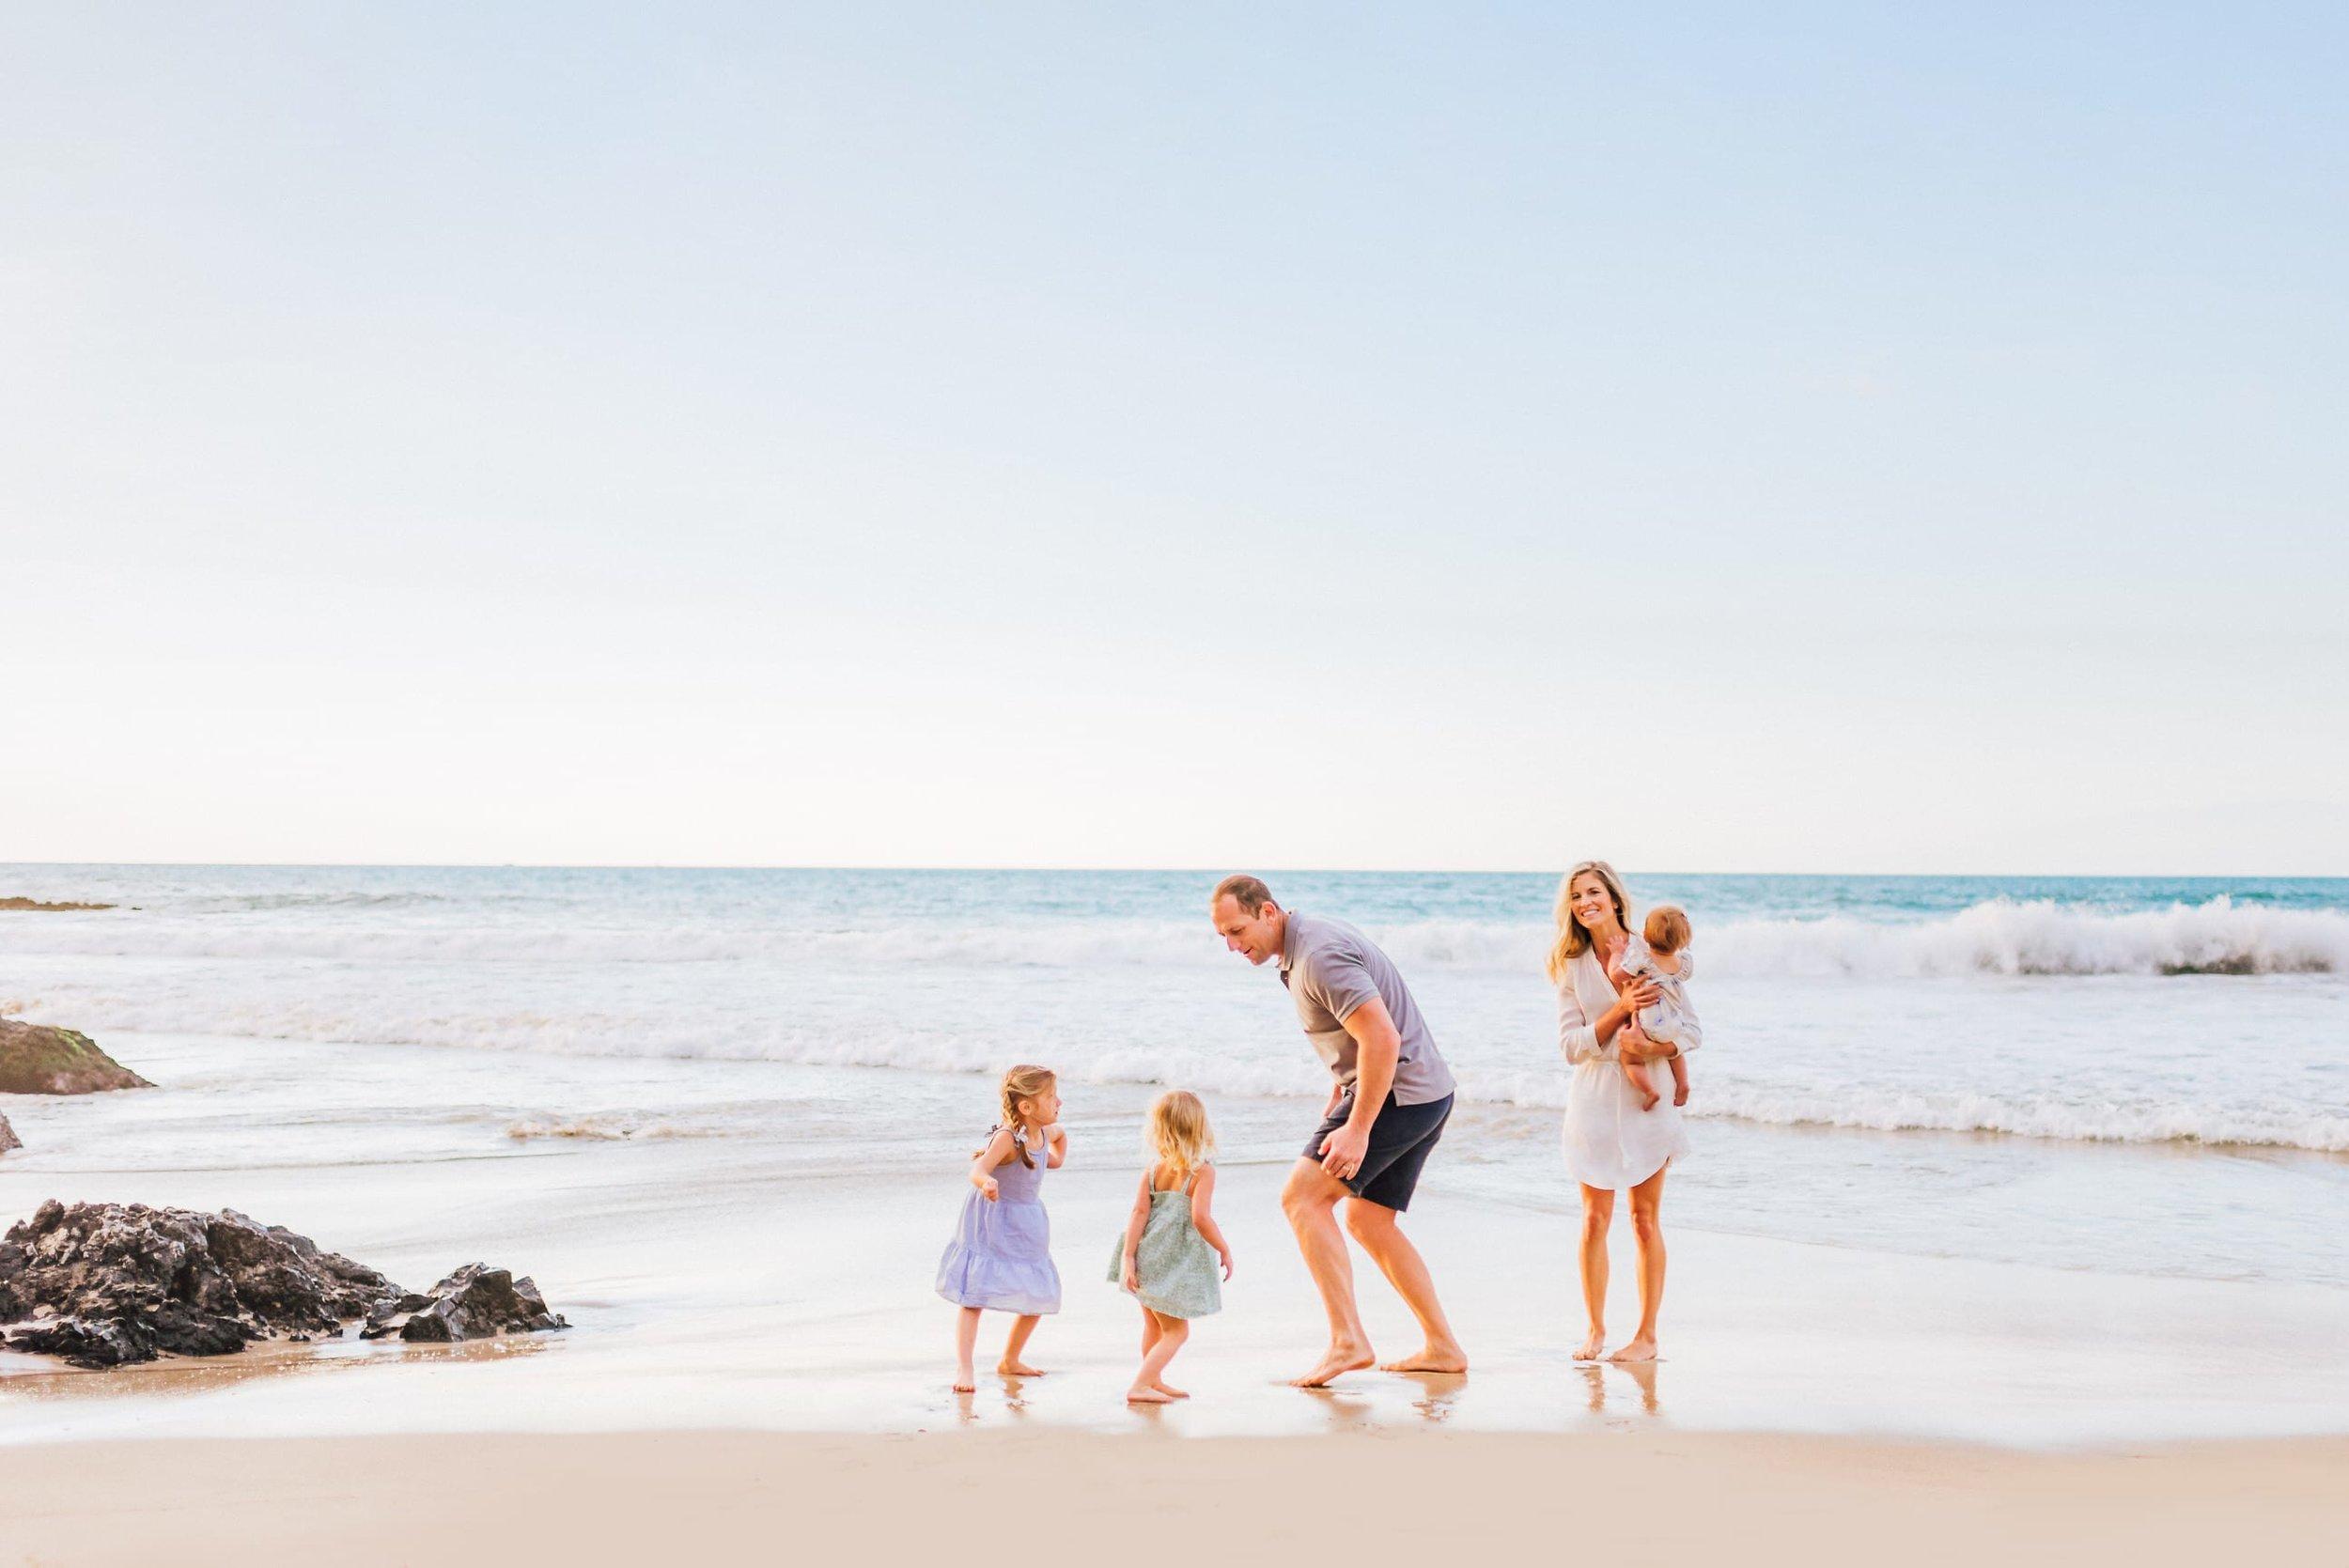 Family-Pictures-Hawaii-Mauna-Kea-Beach-16.jpg